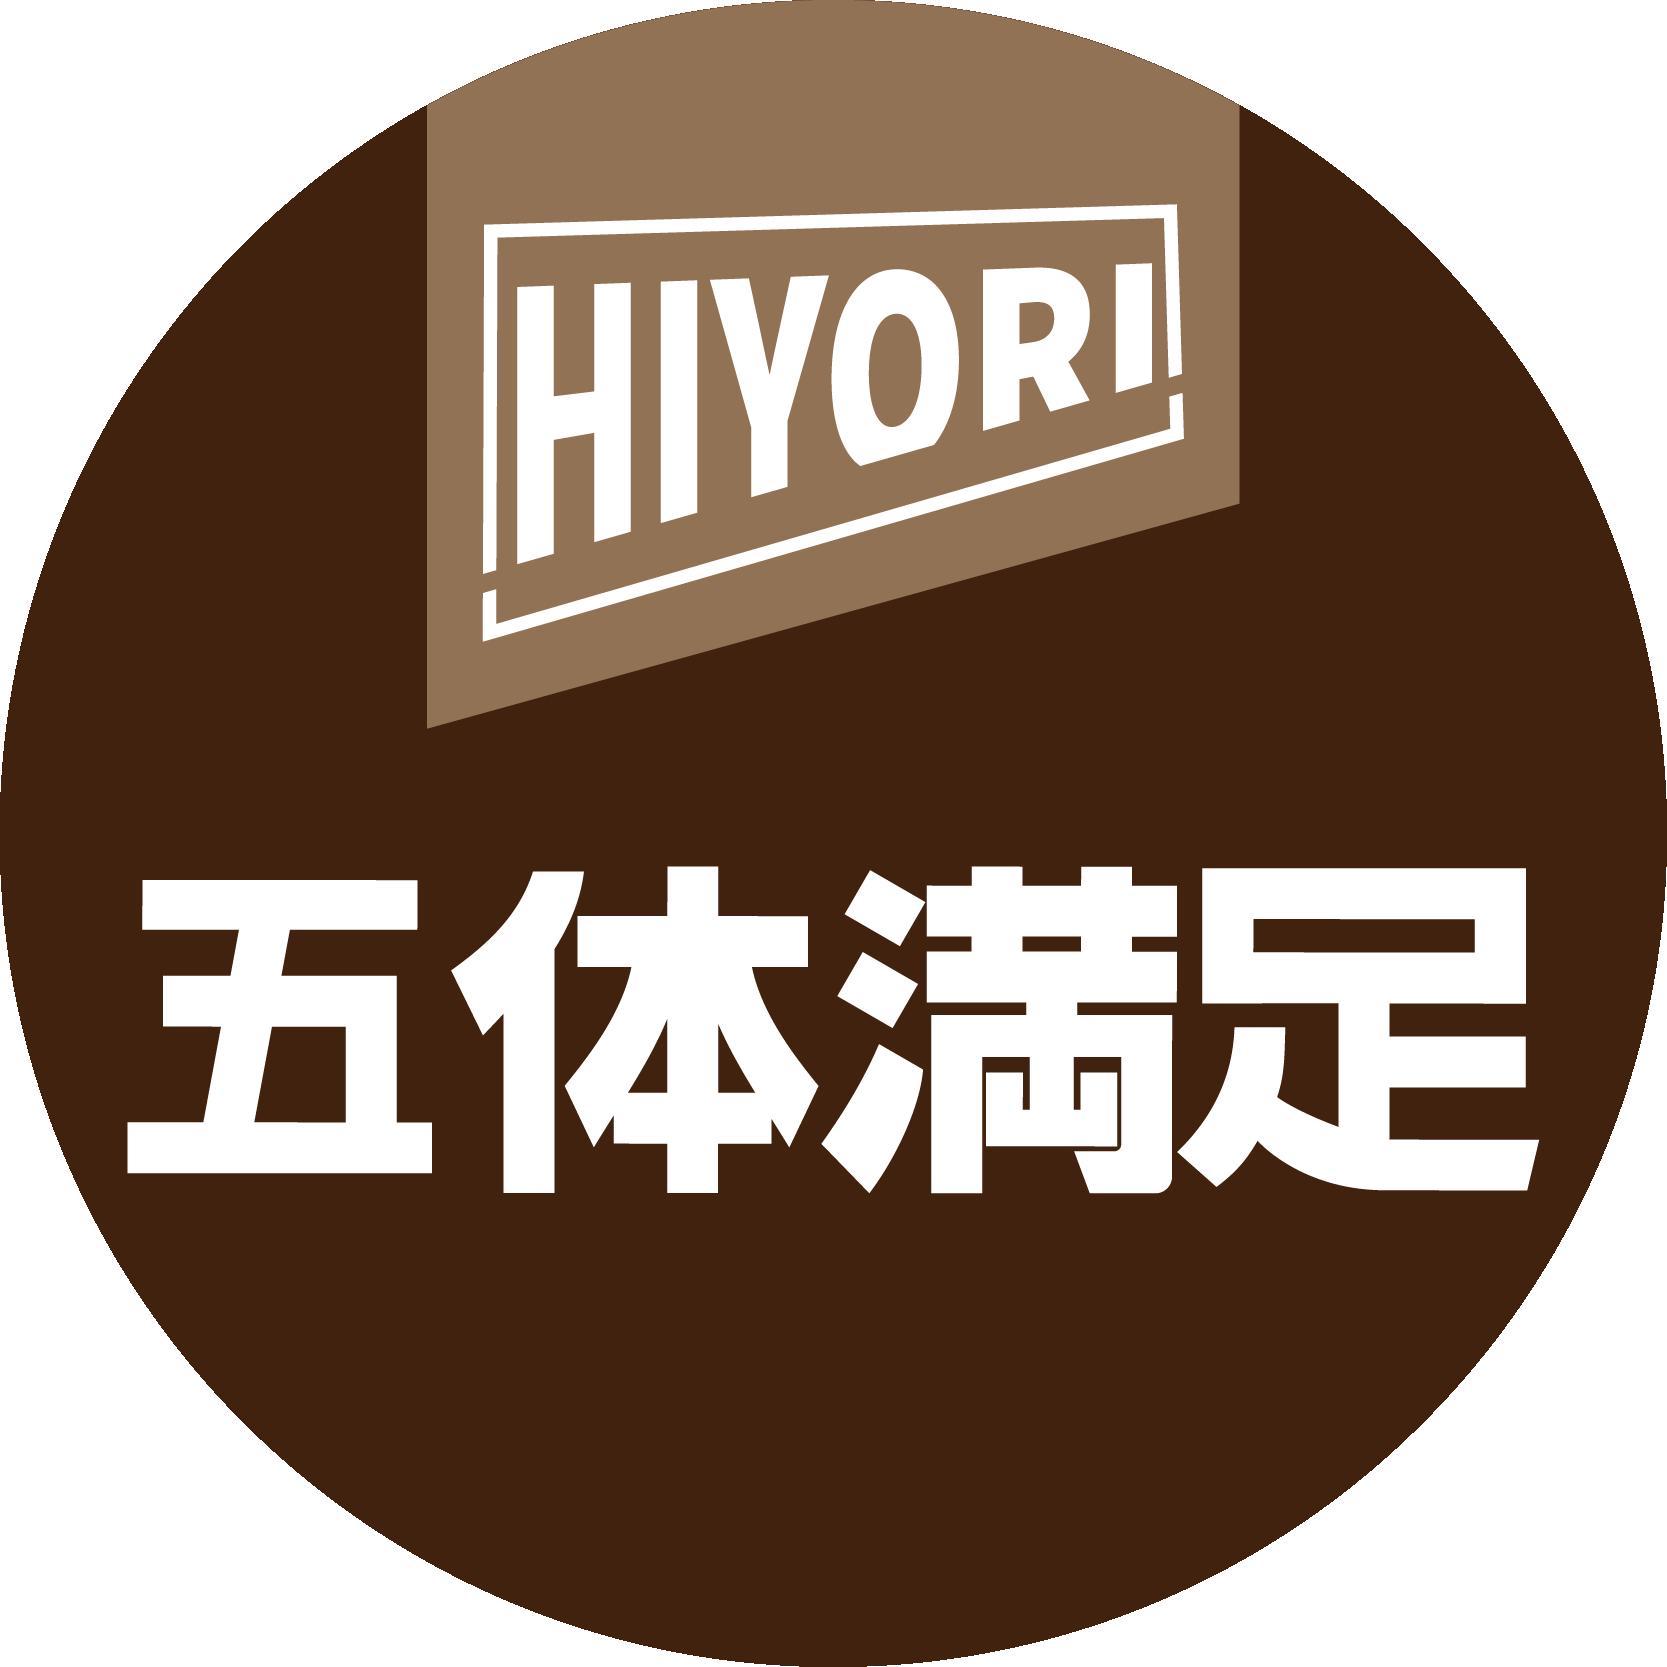 HIYORI_画板1_画板1